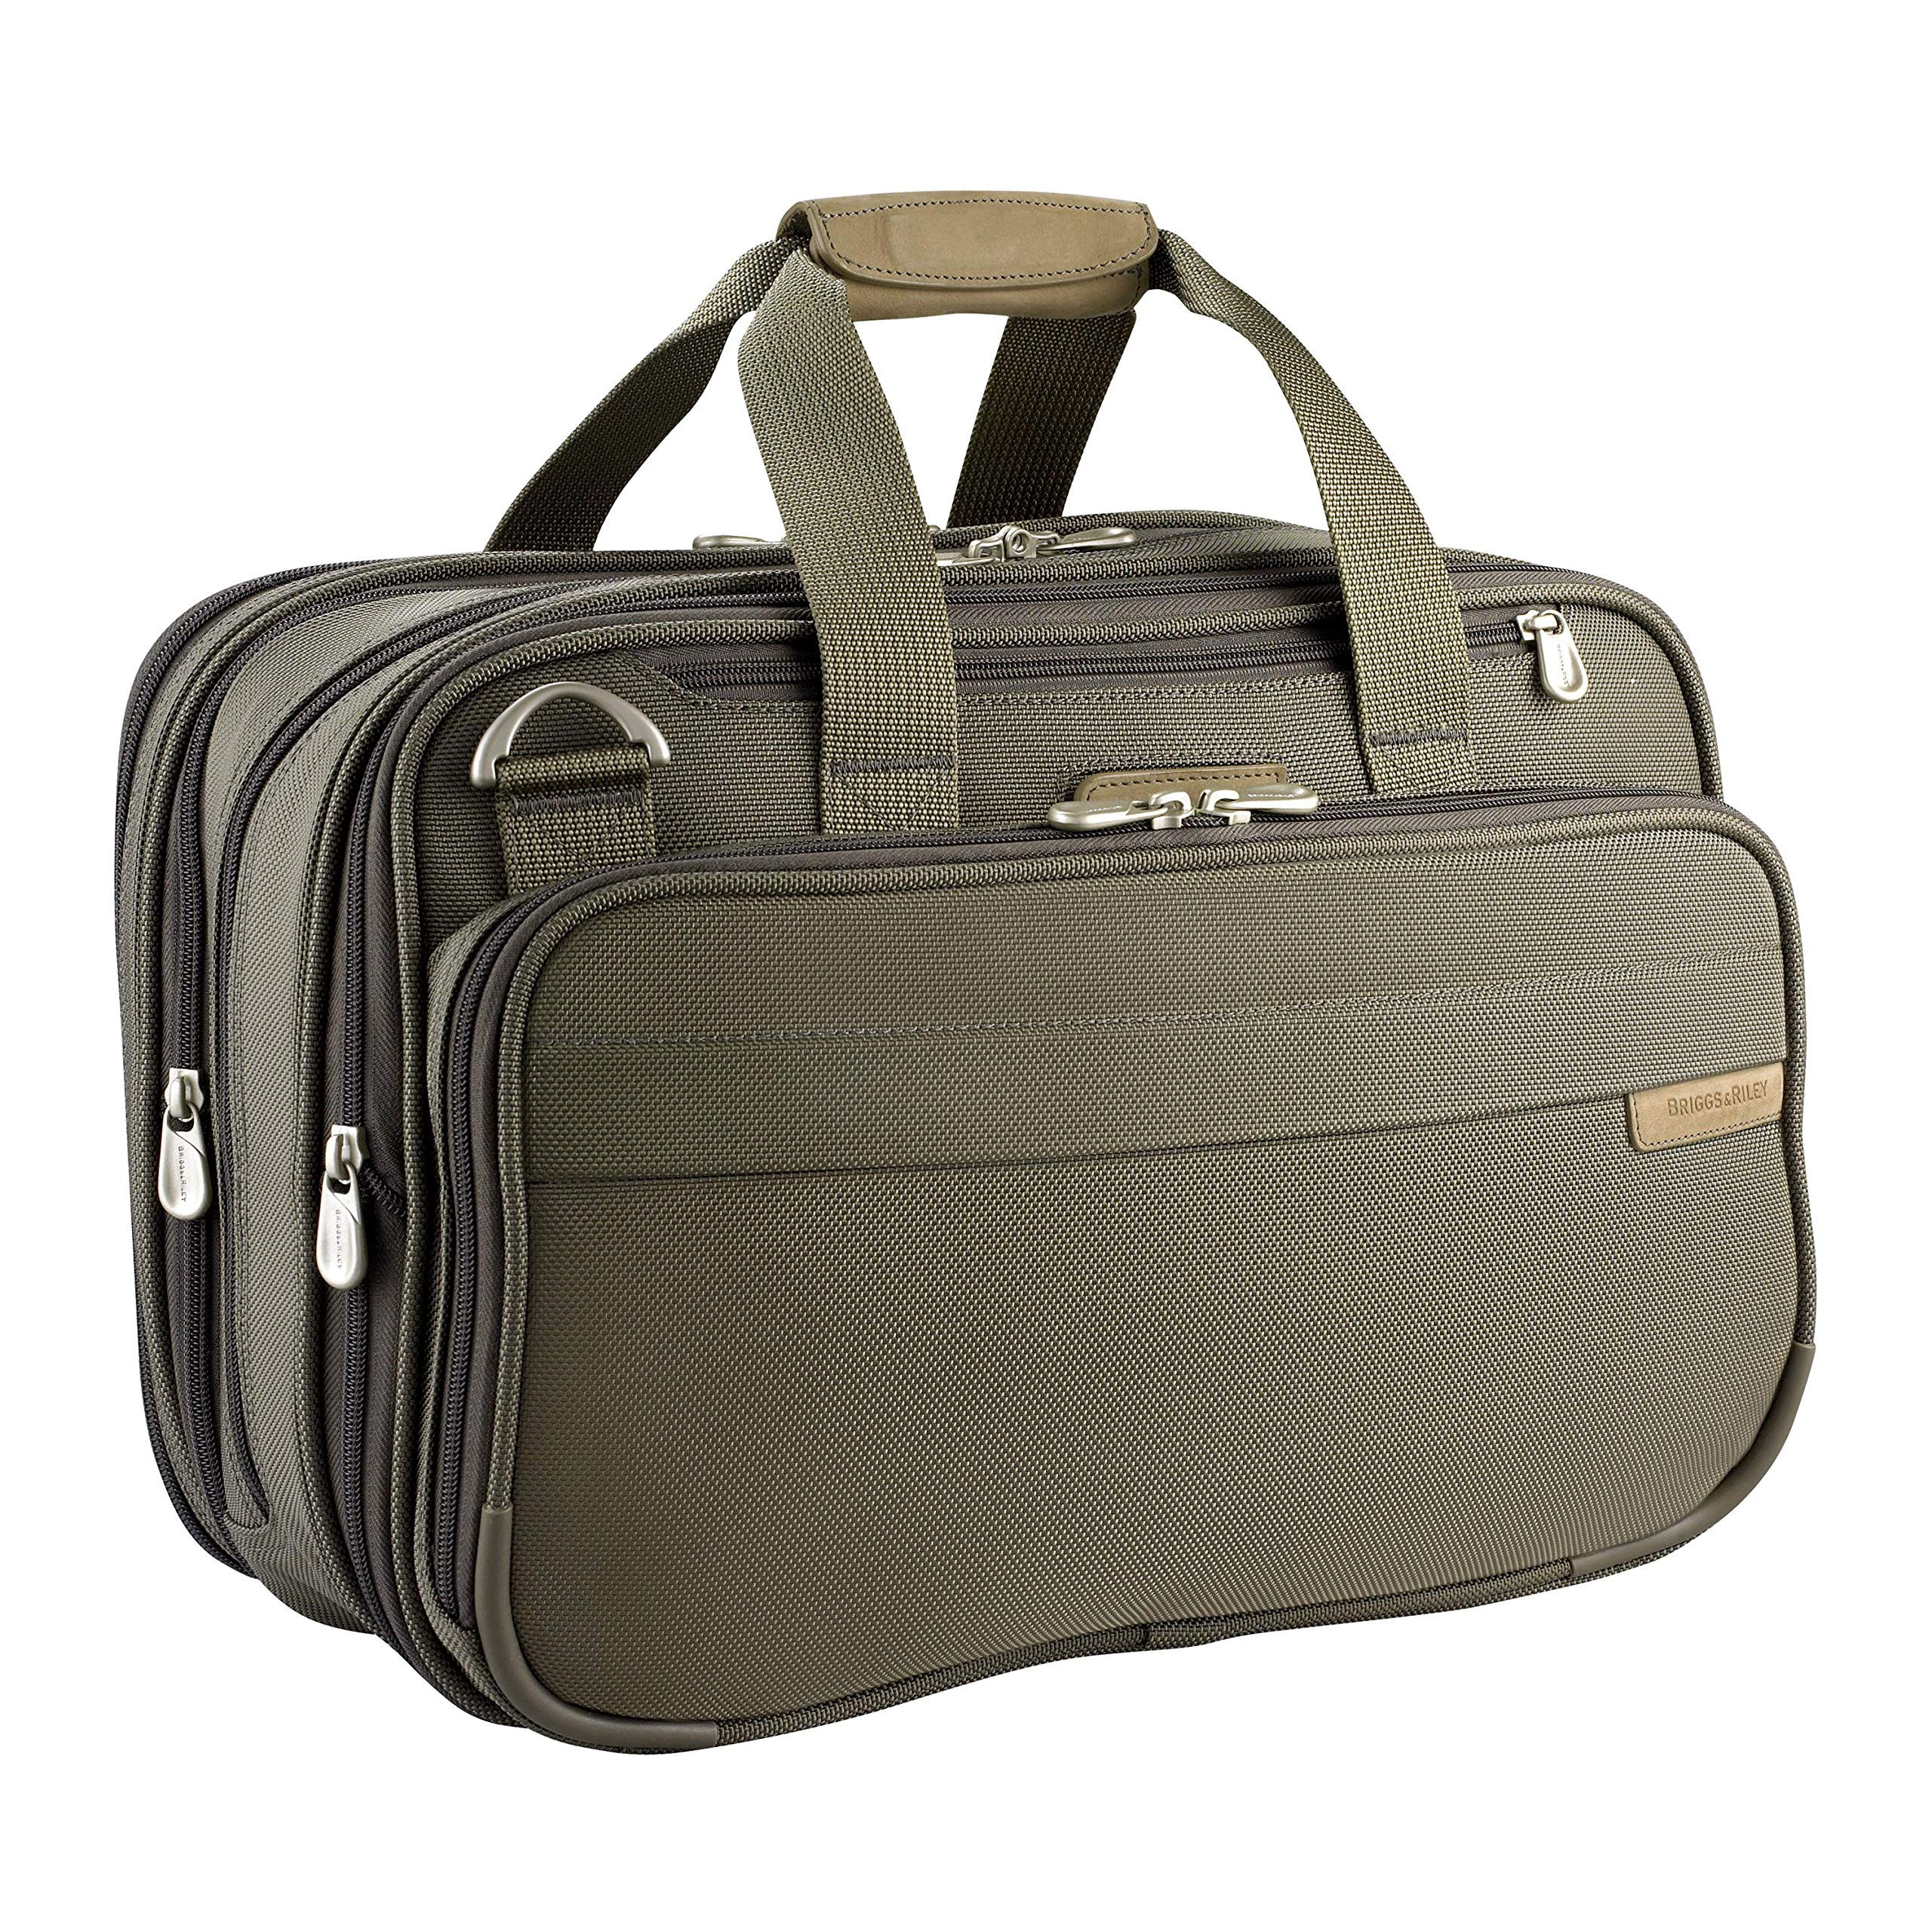 Briggs & Riley Baseline Expandable Cabin Bag, Olive, Medium